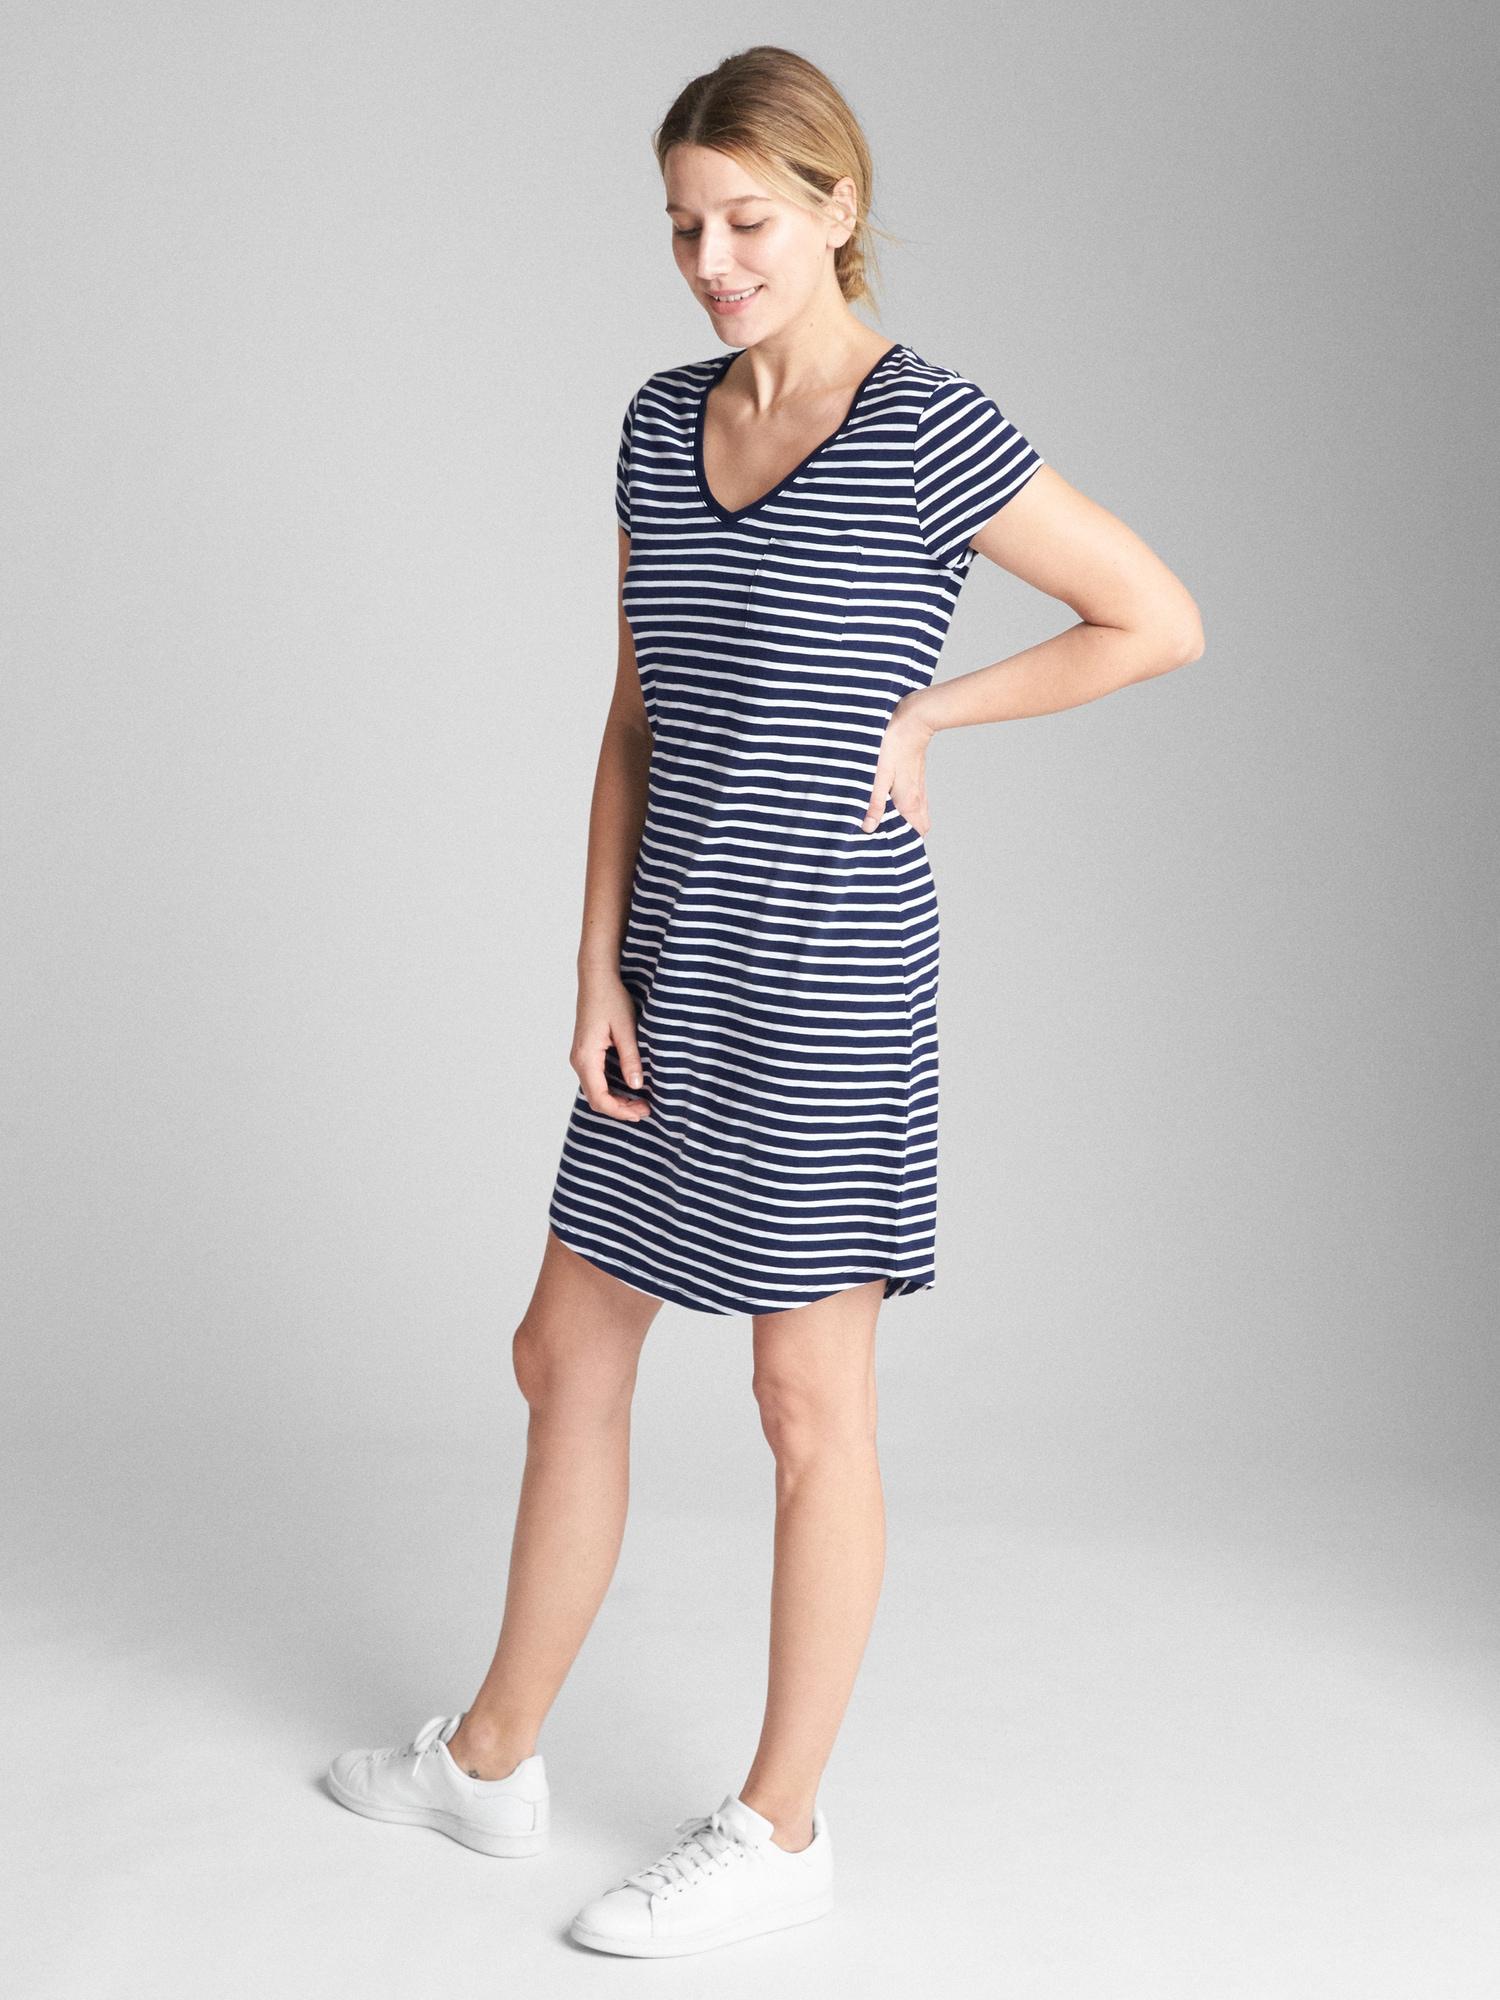 dfafaa62bb88b Gap Short Sleeve Pocket T-shirt Dress in Blue - Lyst